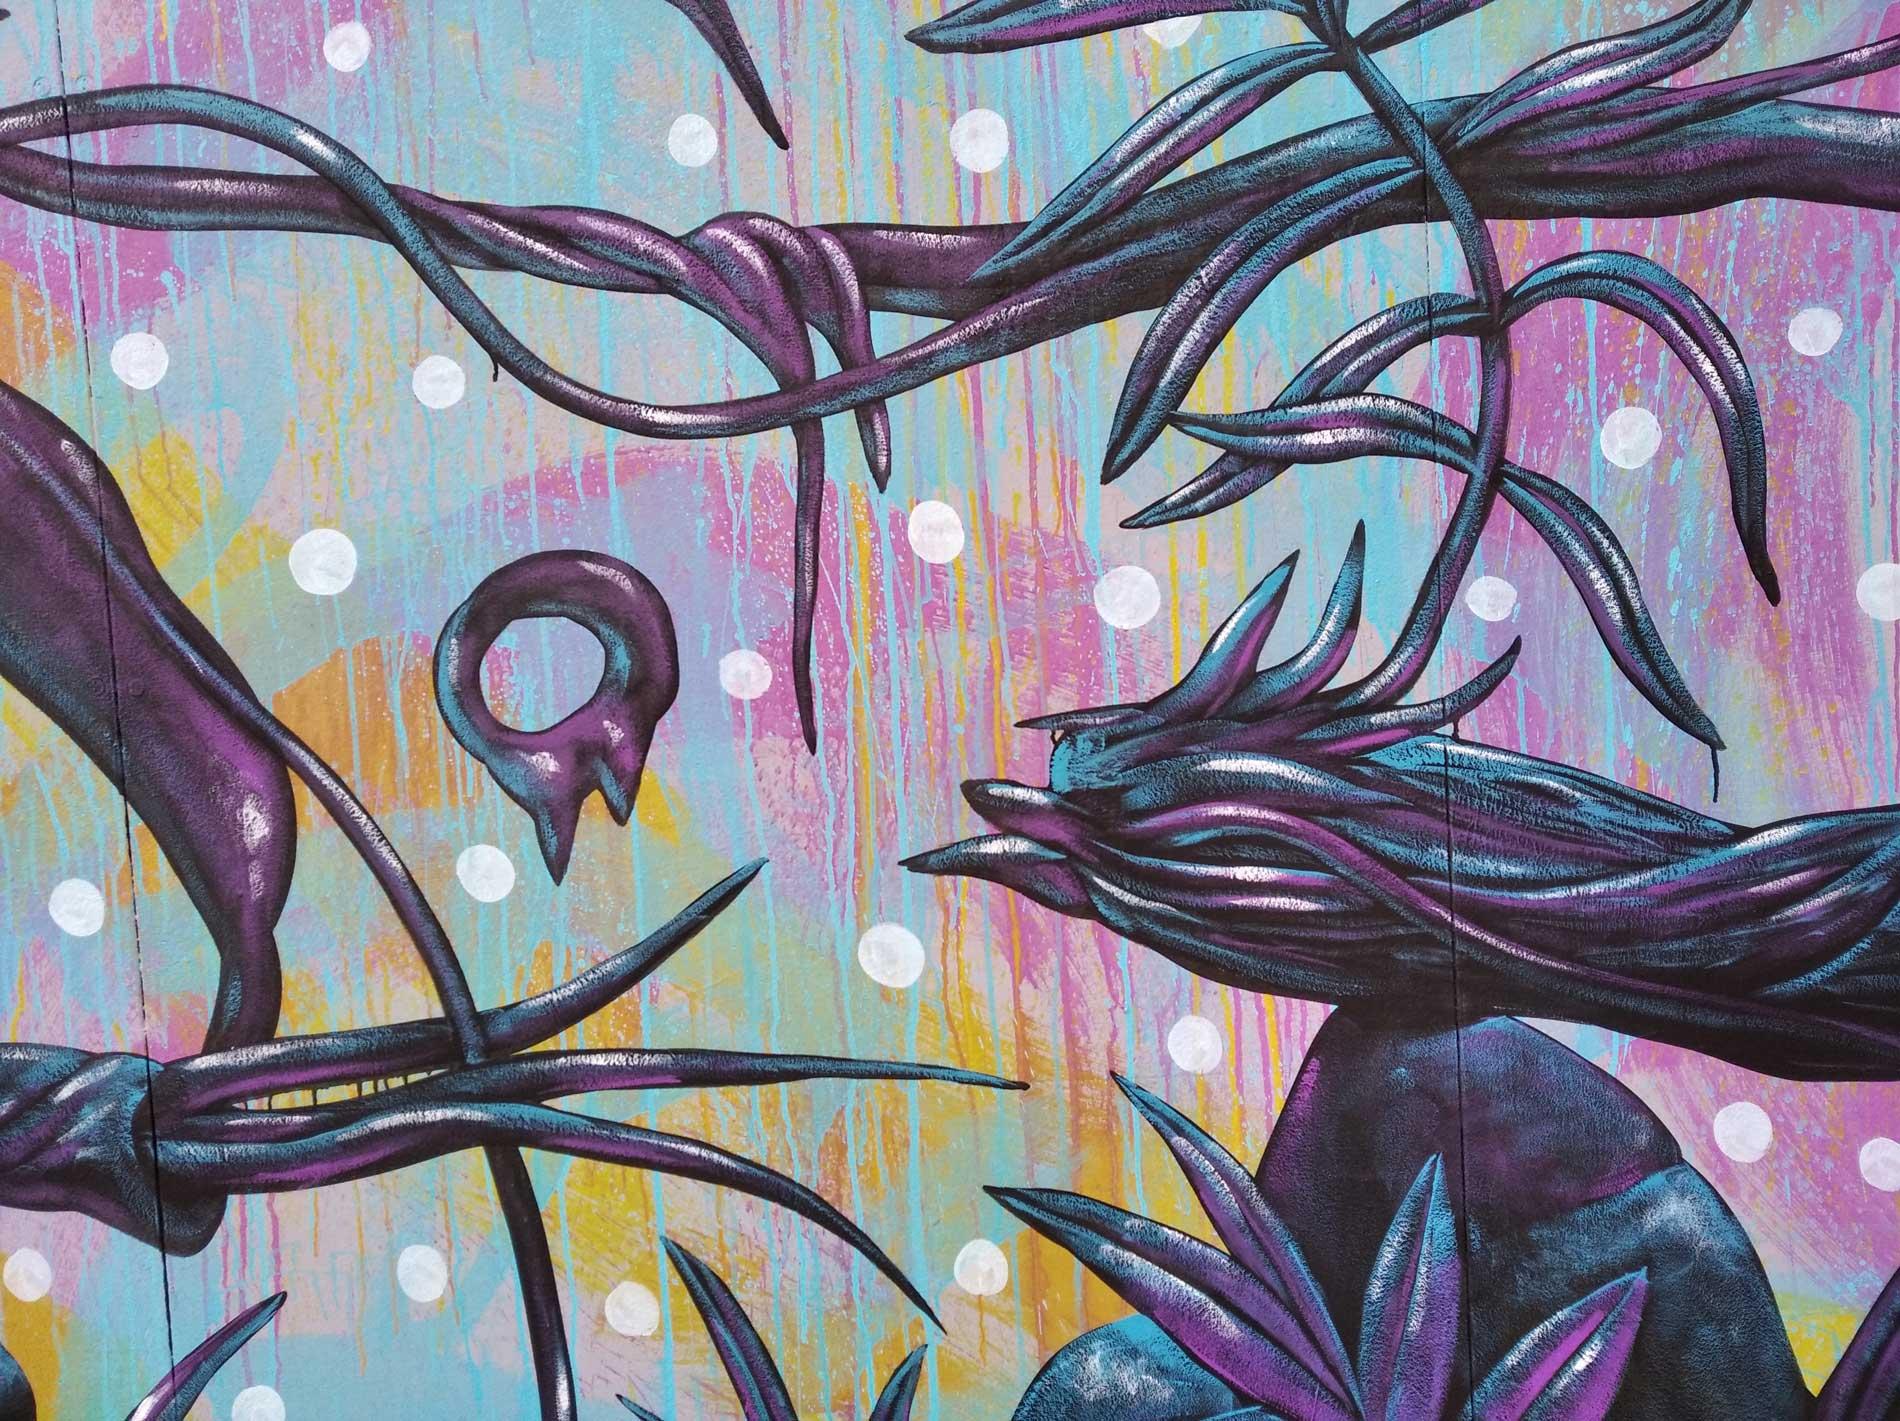 Mur-de-Rennes-detail-organique-3main-Speedy-Graphito-@Monique-Sammut